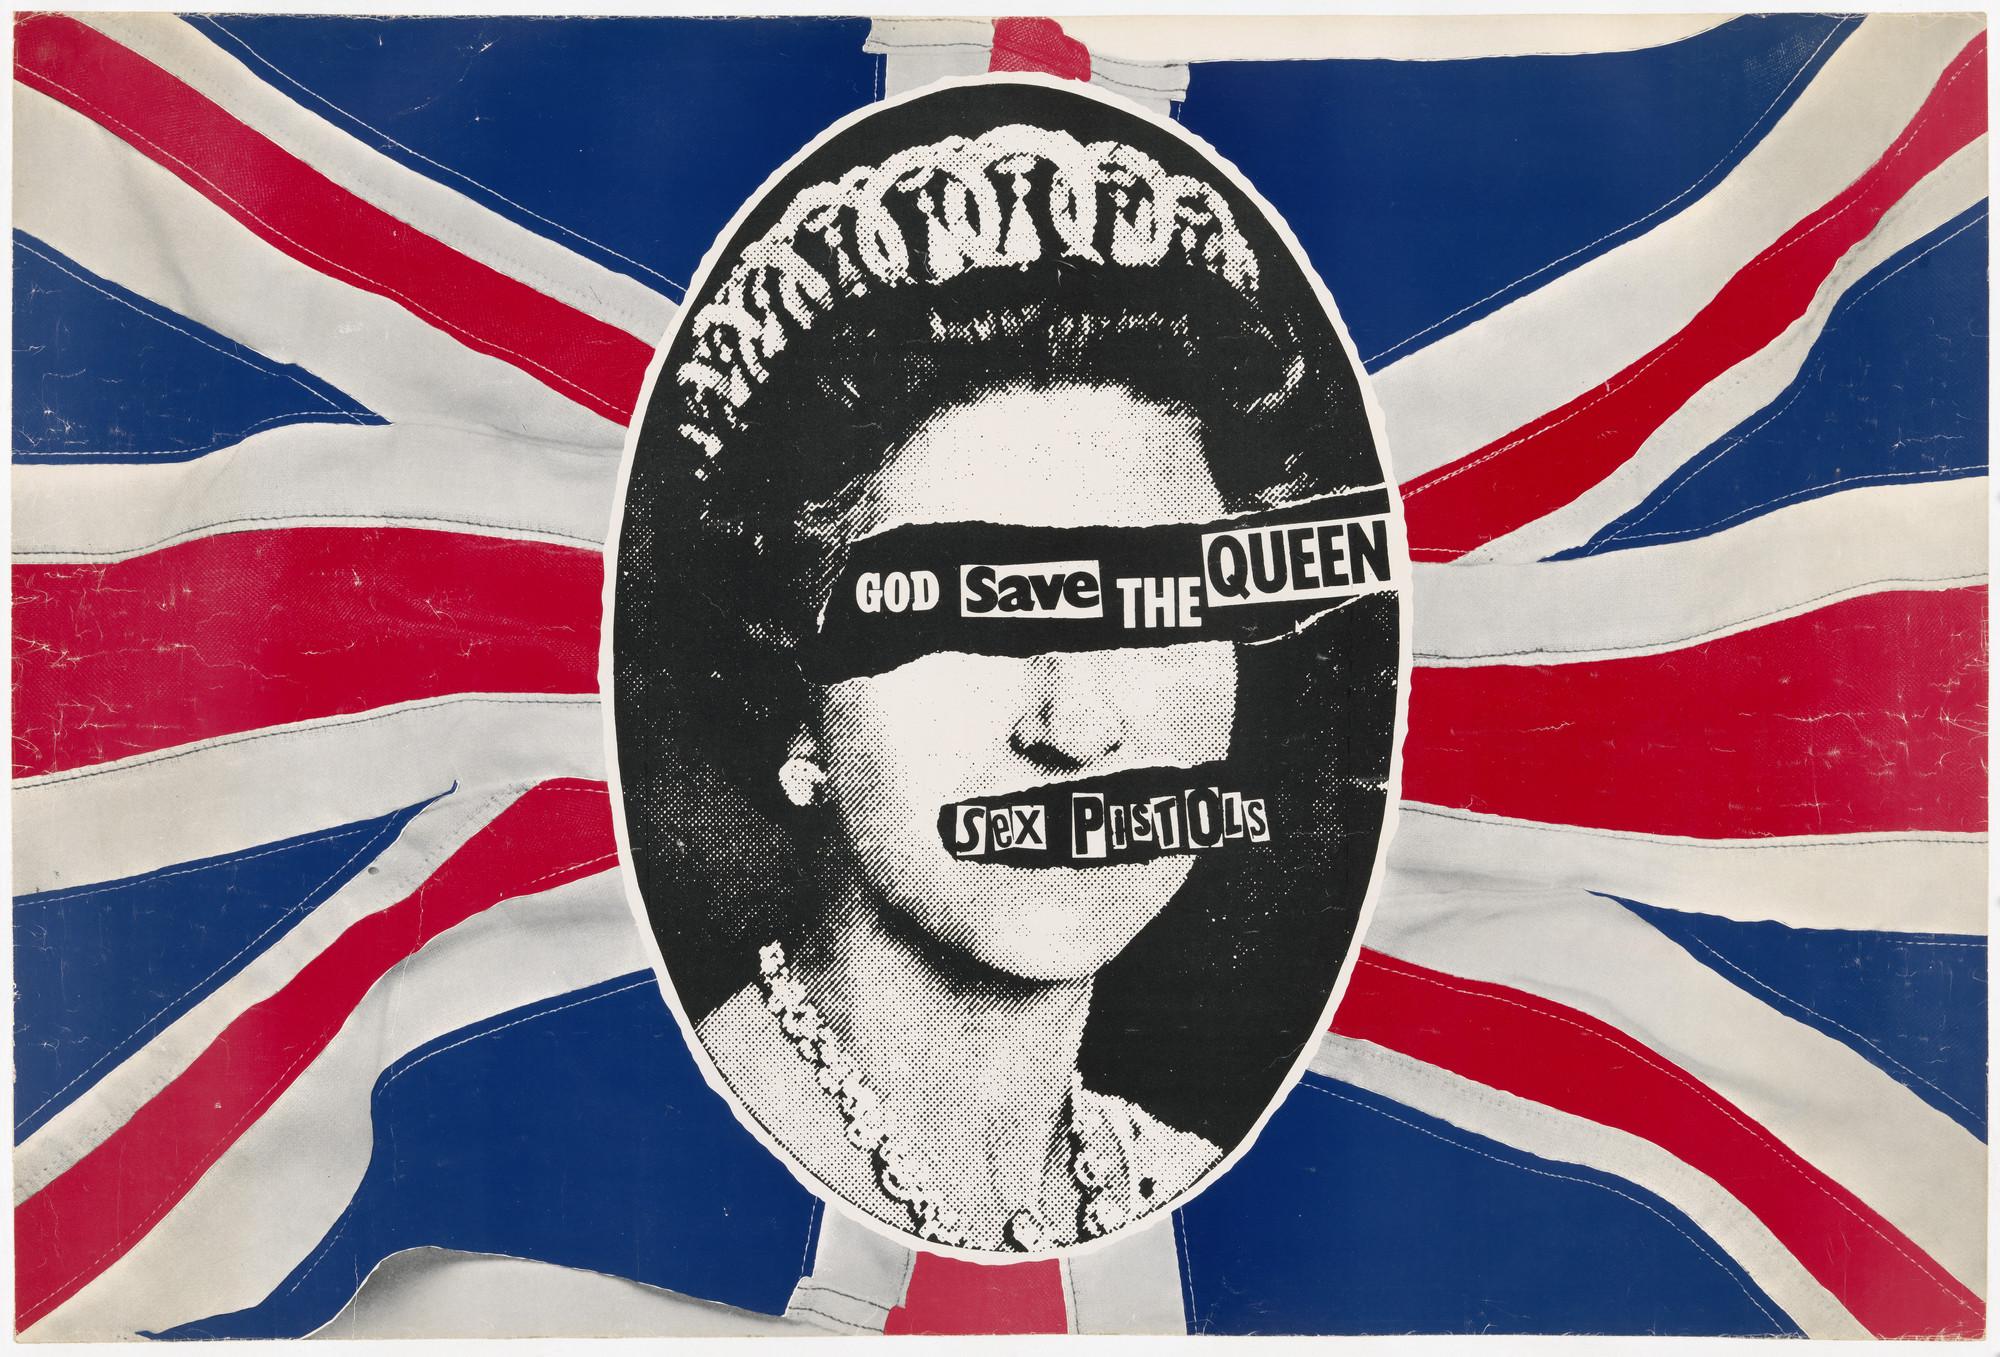 Jamie Reid. Sex Pistols, God Save the Queen. 1977 | MoMA